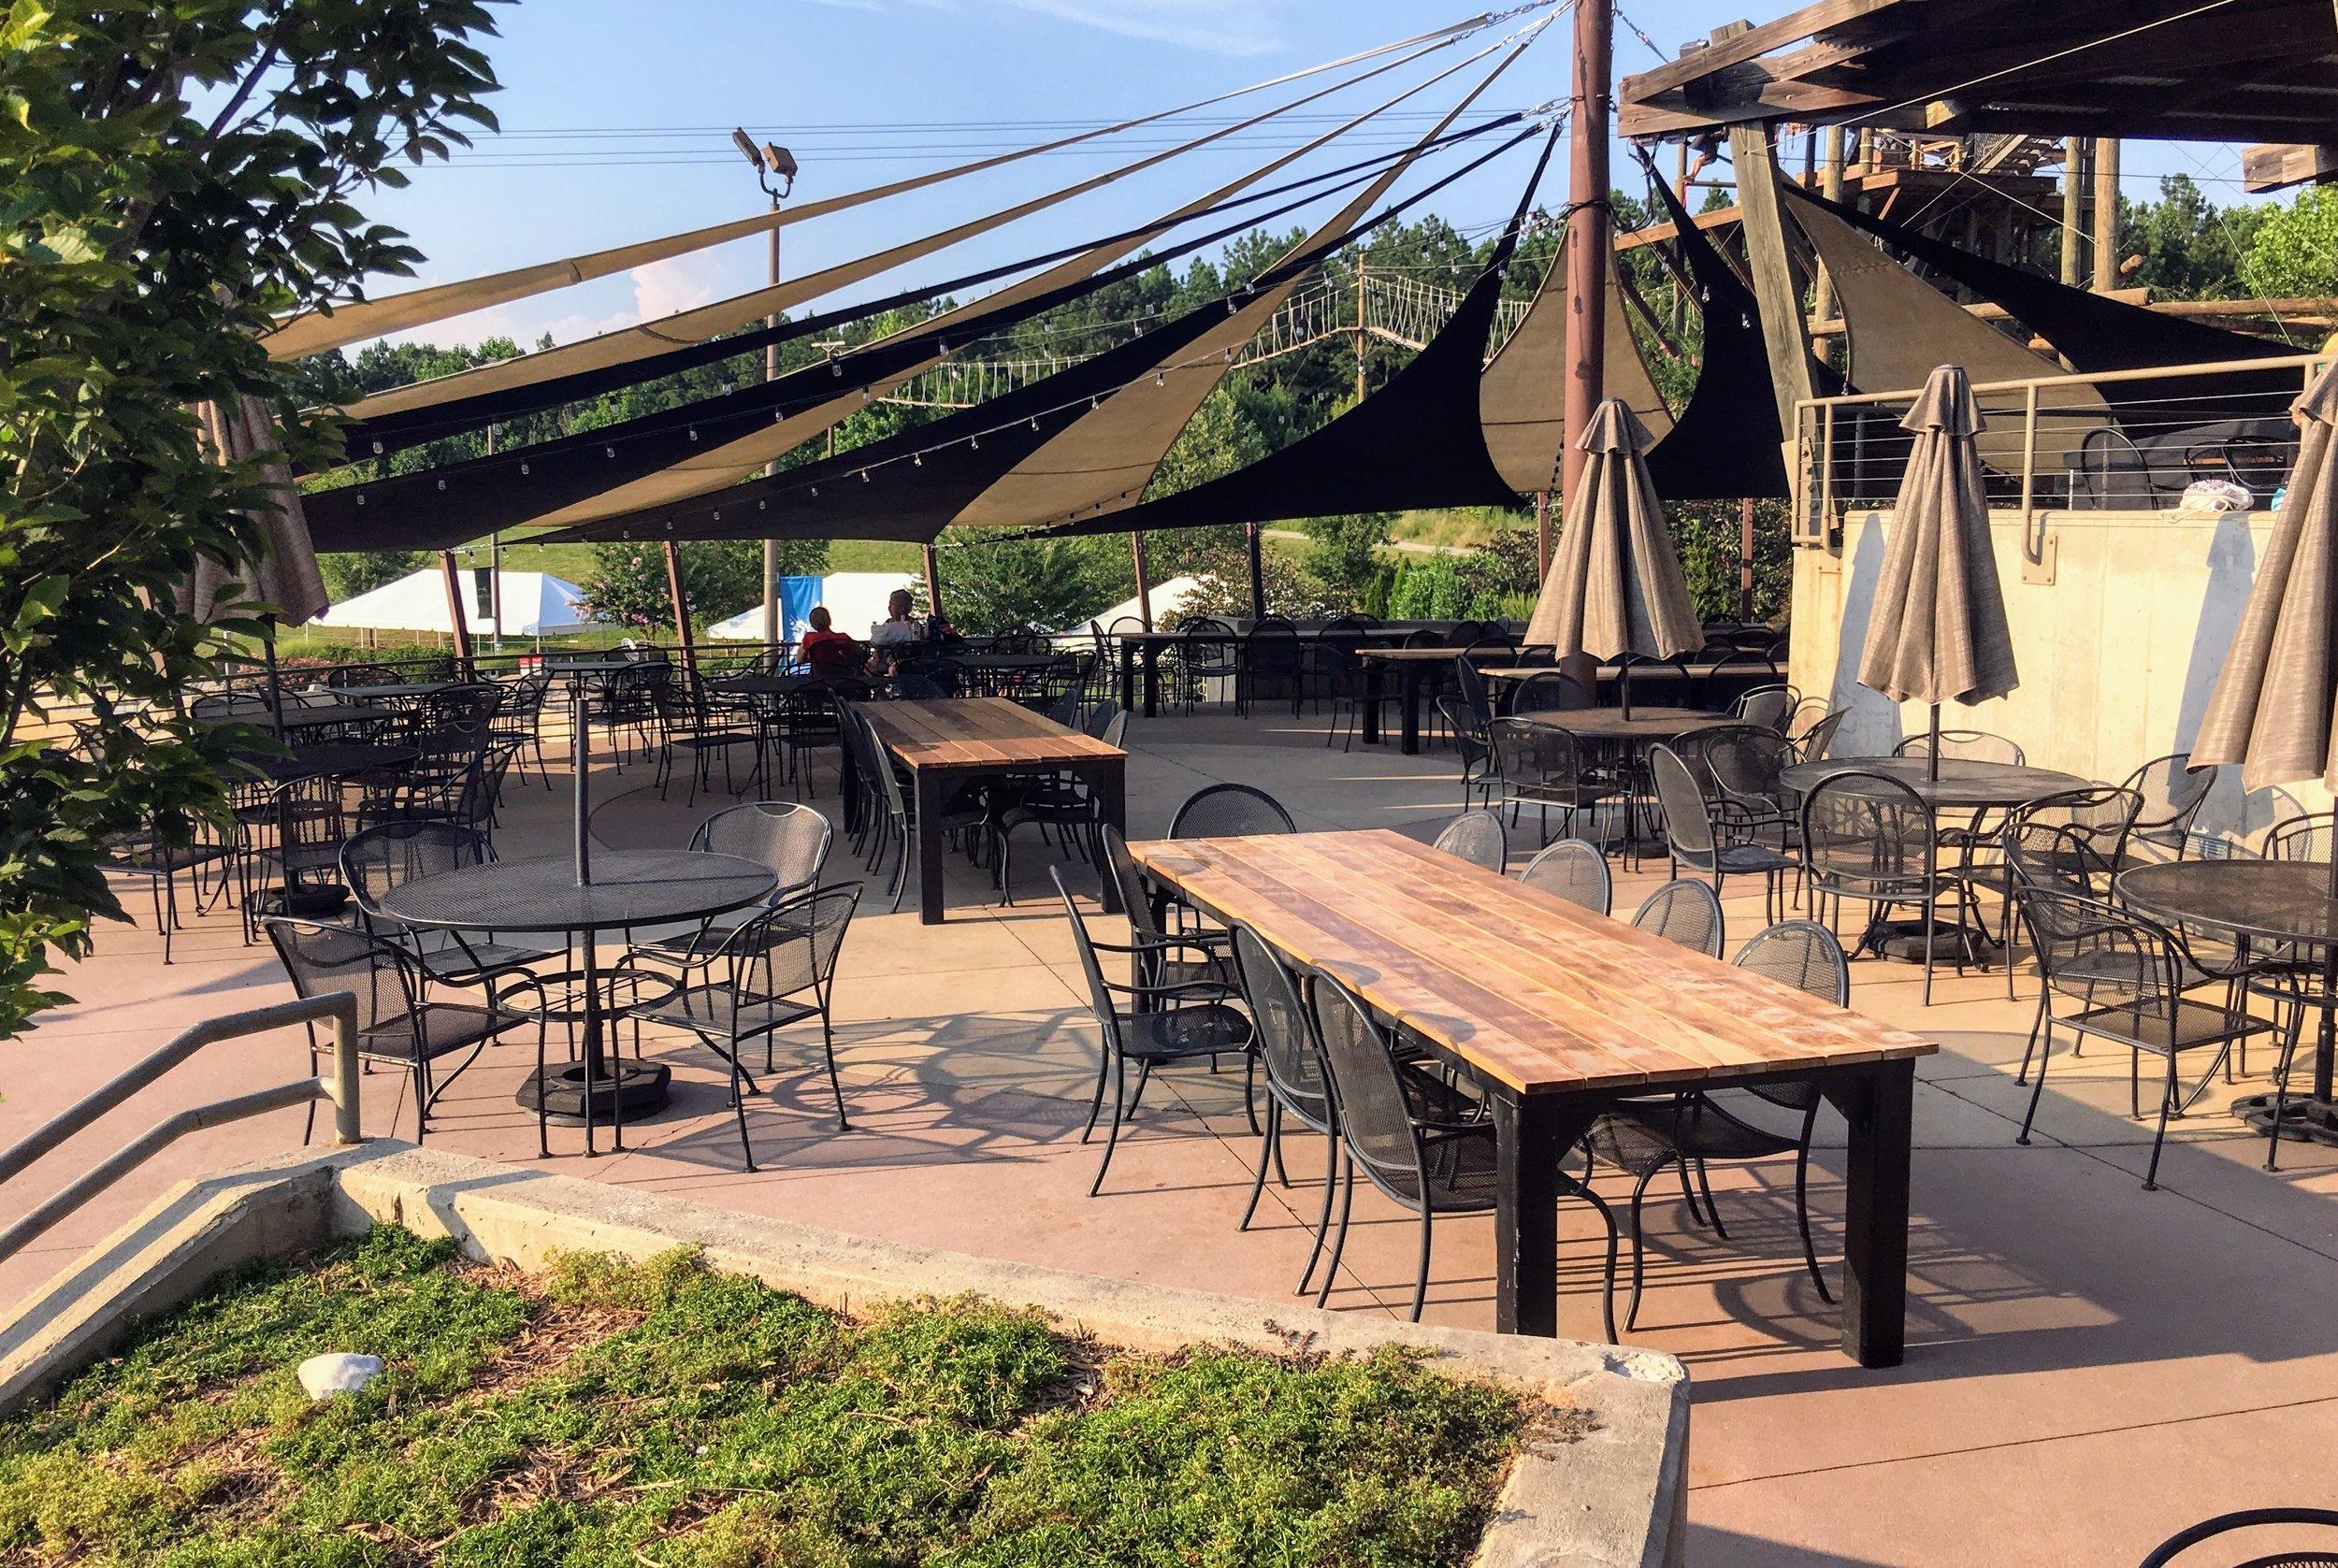 U.S.National whitewater center restaurant tables